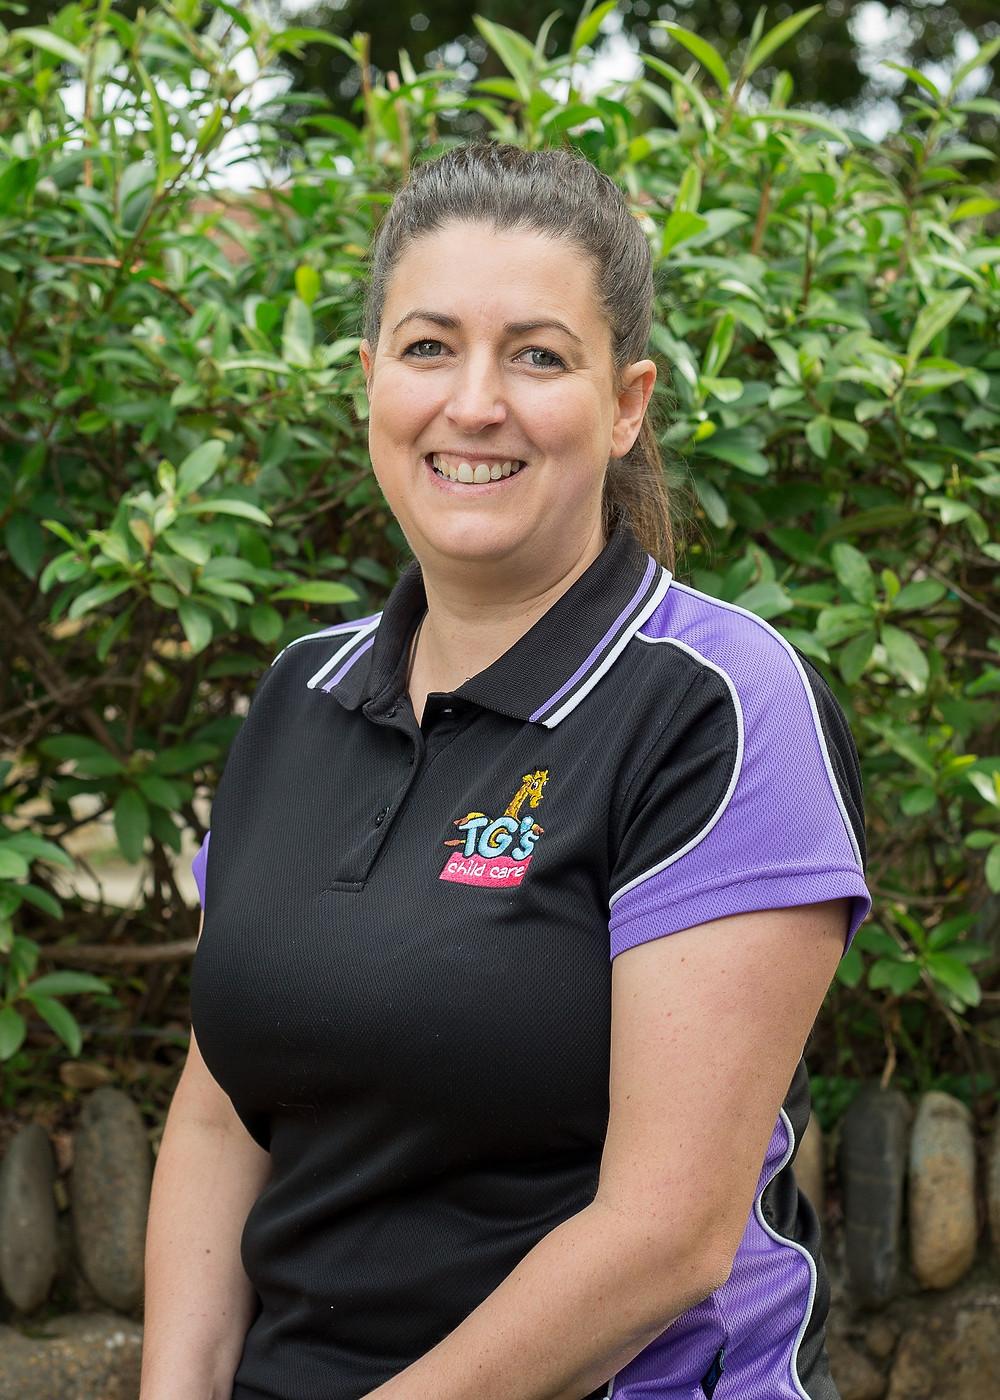 Skye McGeoch TG's Child Care Urangan Joeys room educator